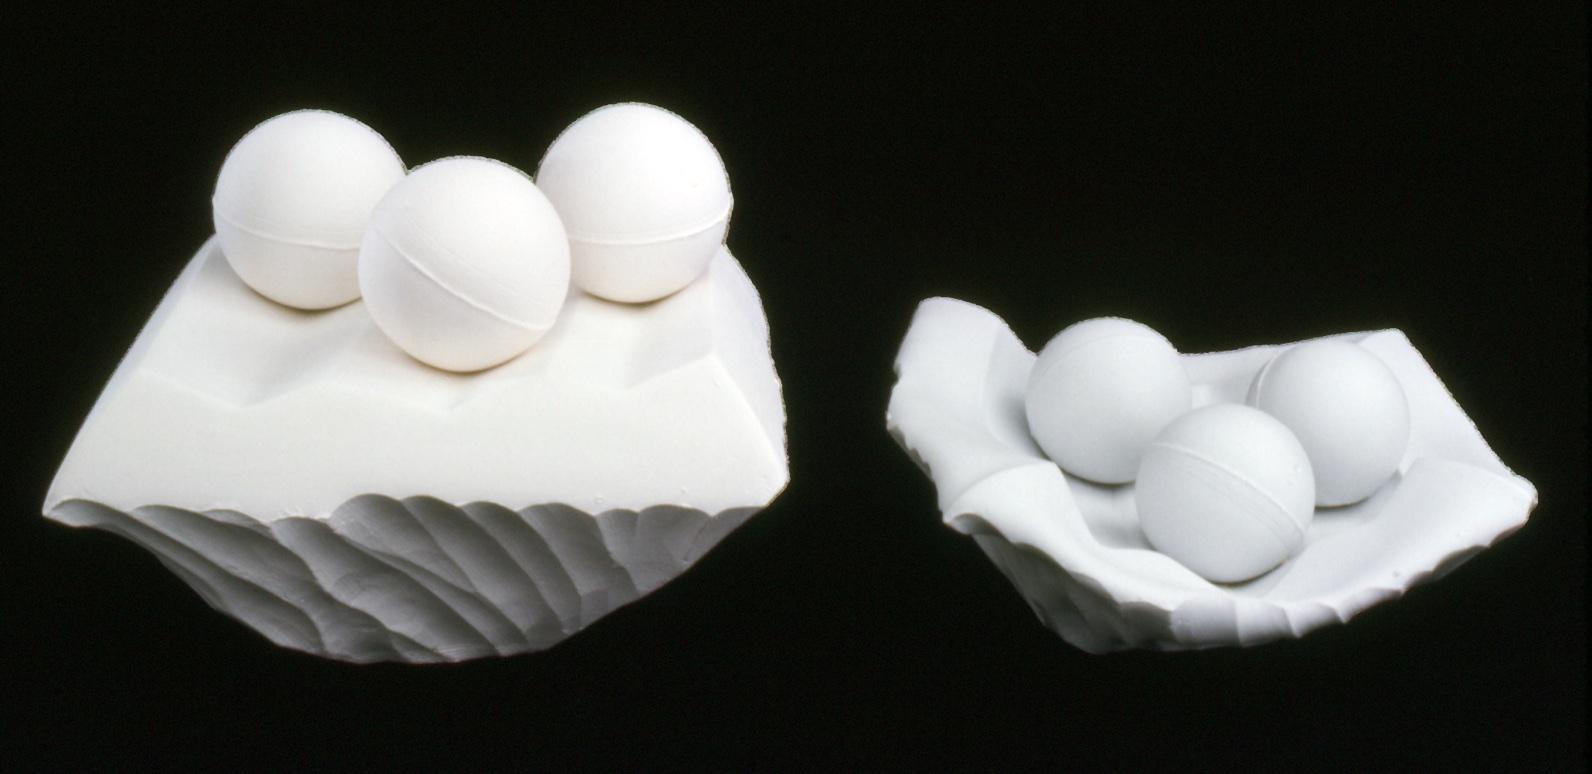 Crucible series: Slip-cast porcelain & mixed media constructions w/ experimental firing